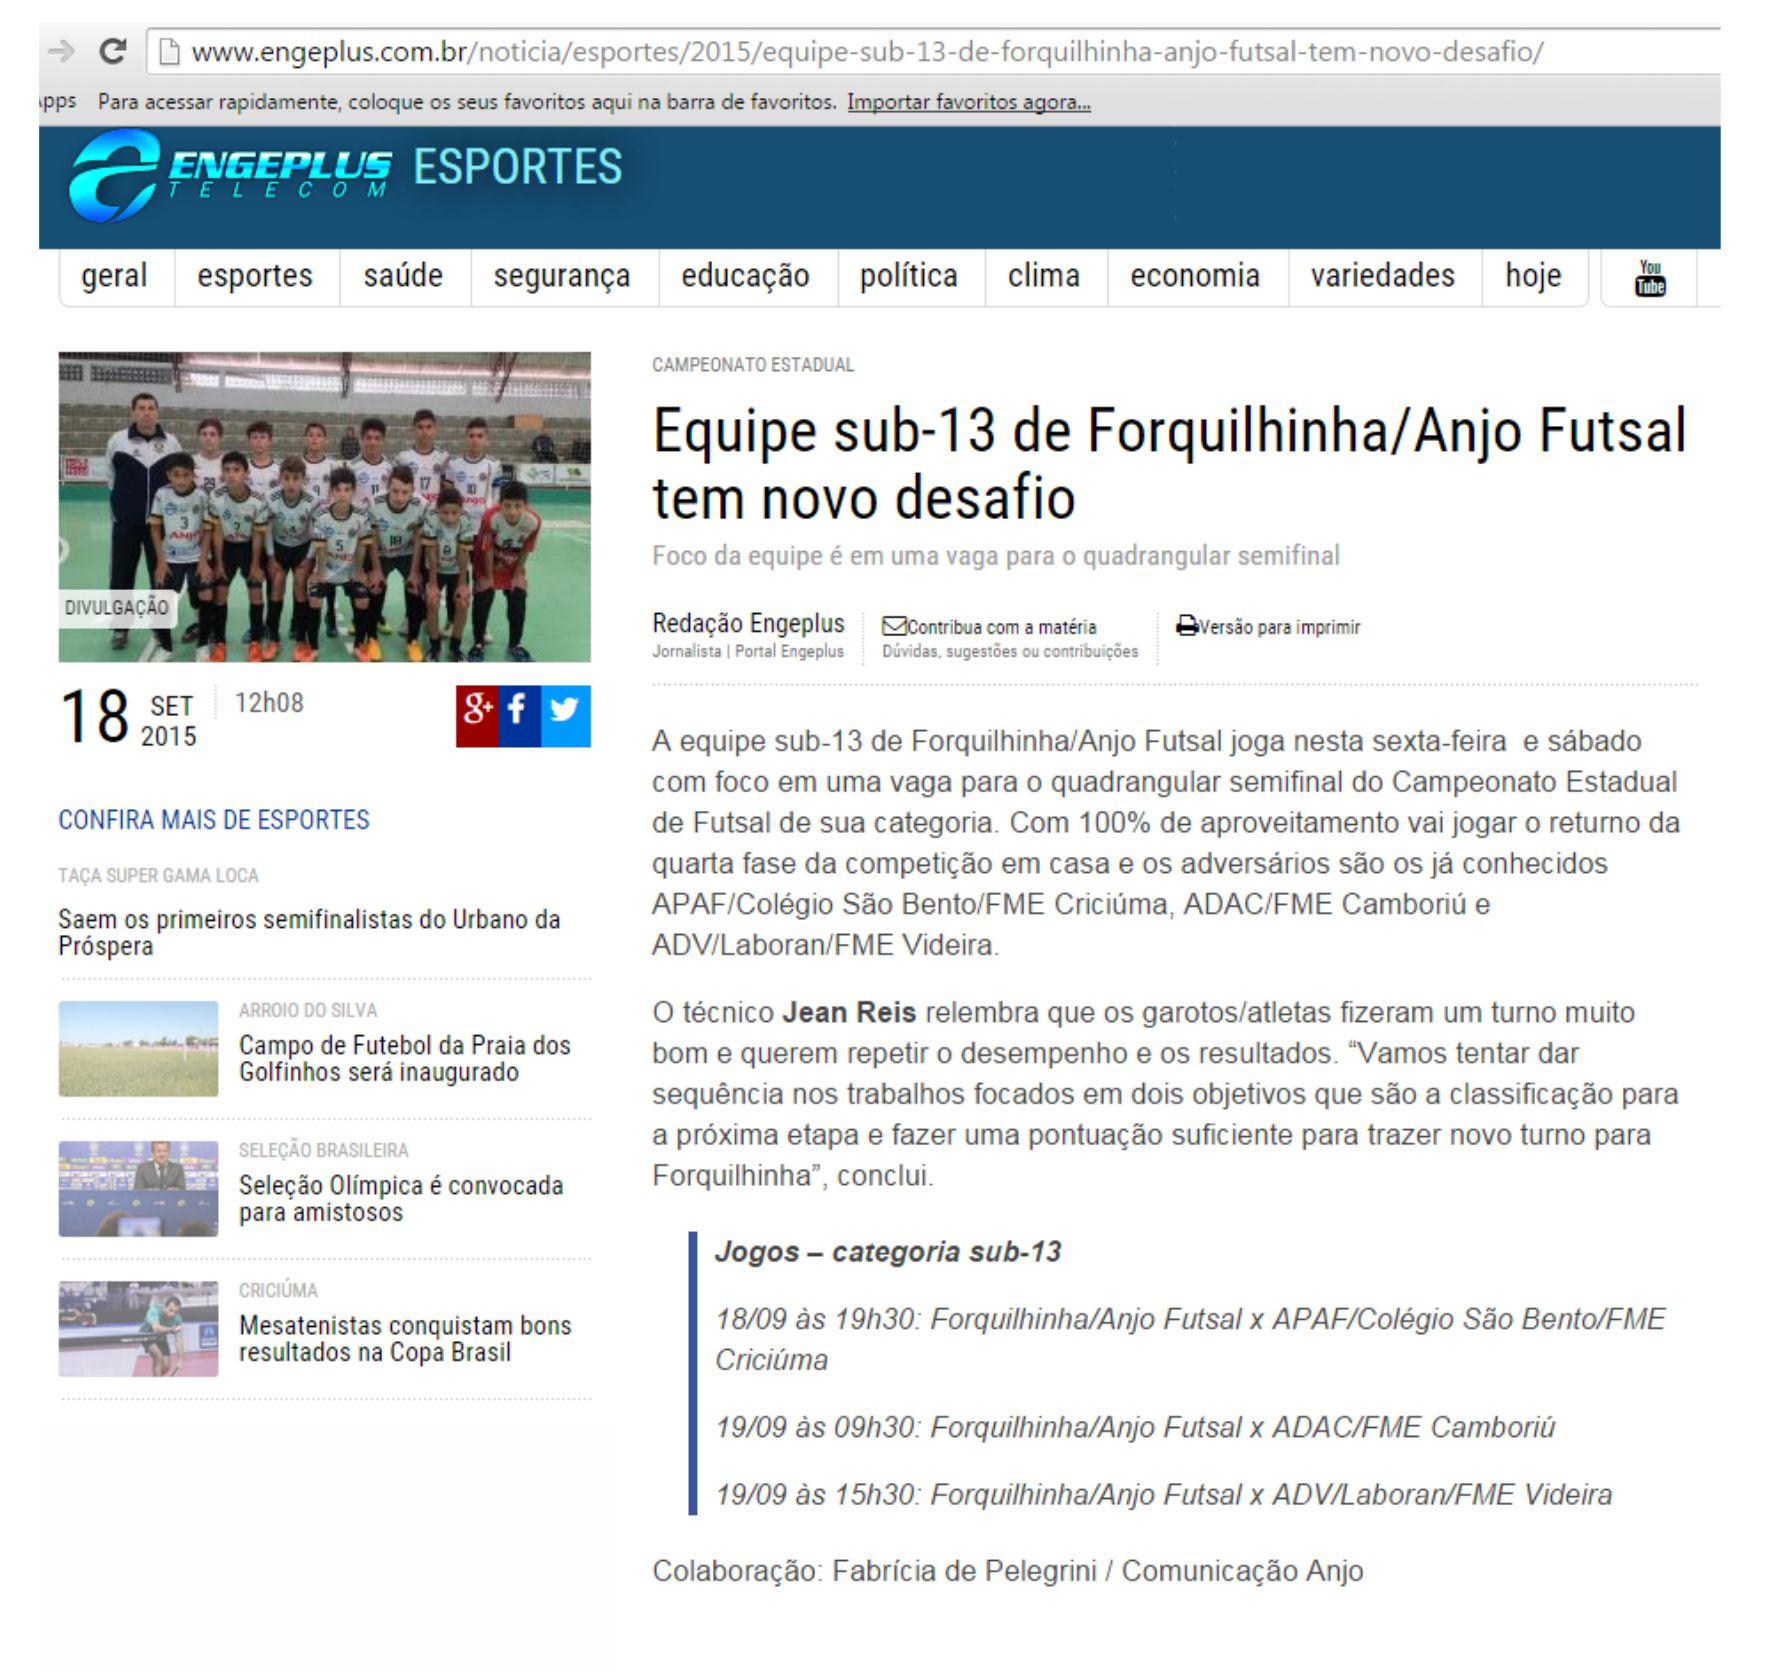 8bcf731993 Anjos do Futsal na Imprensa - 18 09 2015 a 28 09 2015 - Anjos do ...